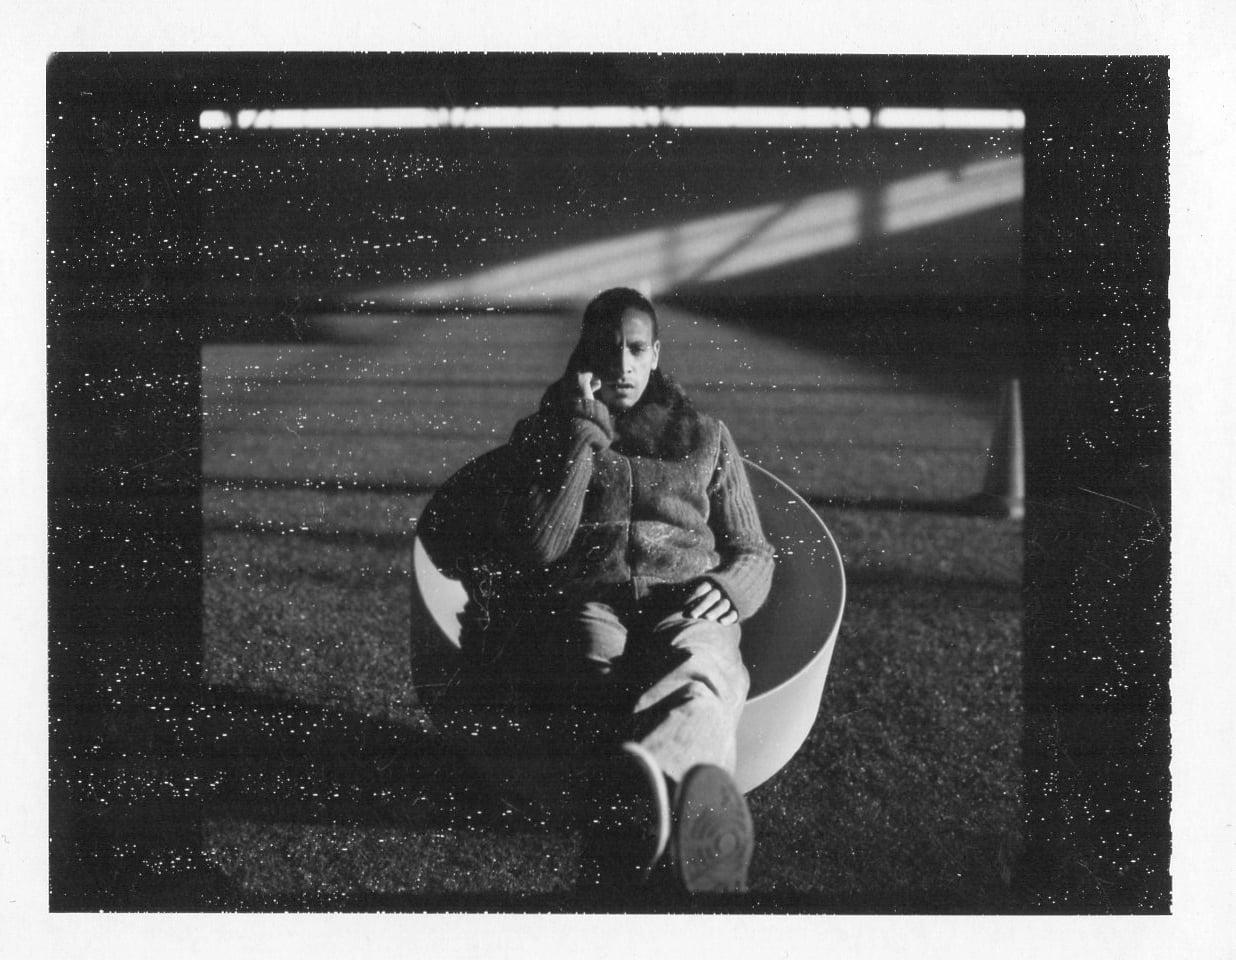 From the polaroid archive: Rio Ferdinand